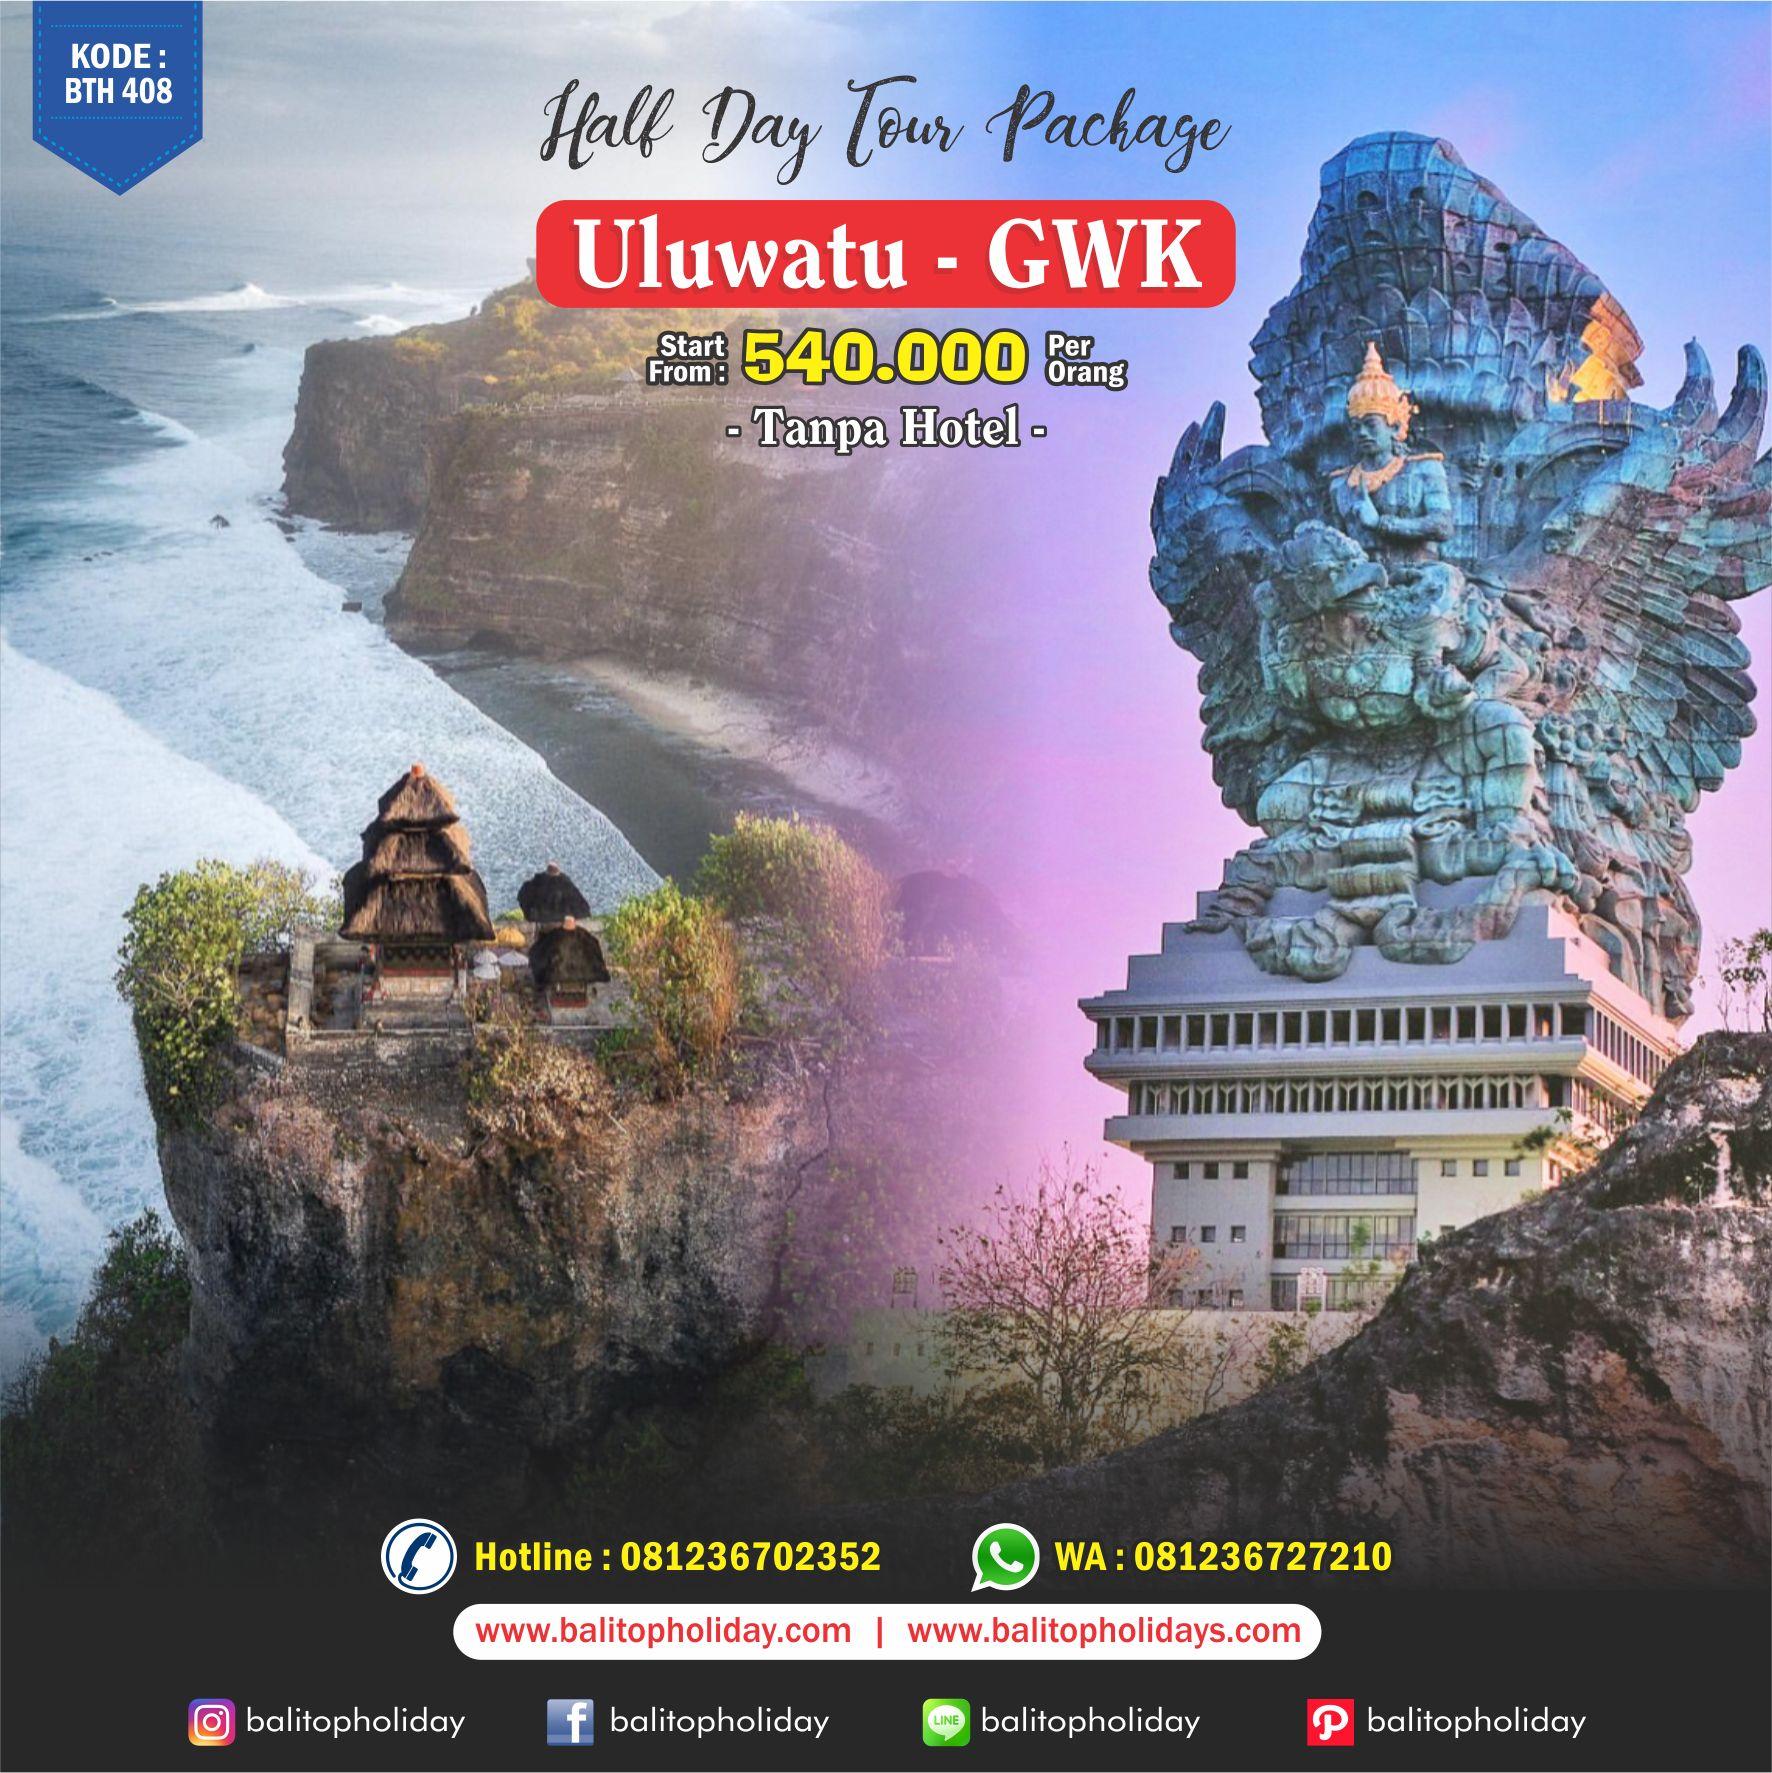 Paket Halfday Tour Uluwatu - GWK BTH 408